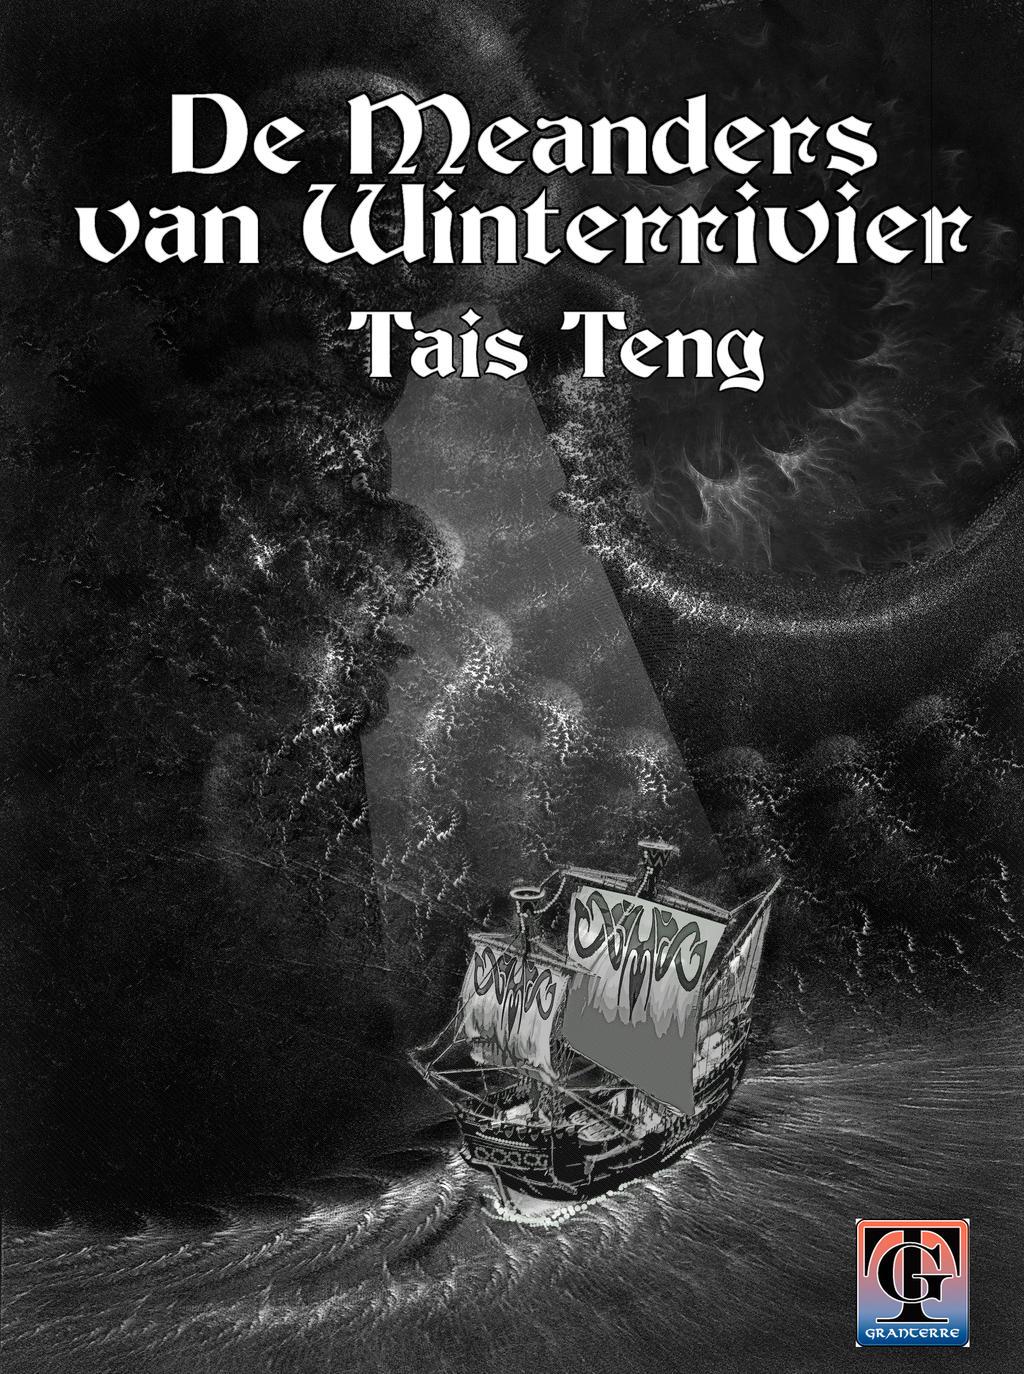 Cover for DE MEANDERS VAN WINTERRIVIER by taisteng